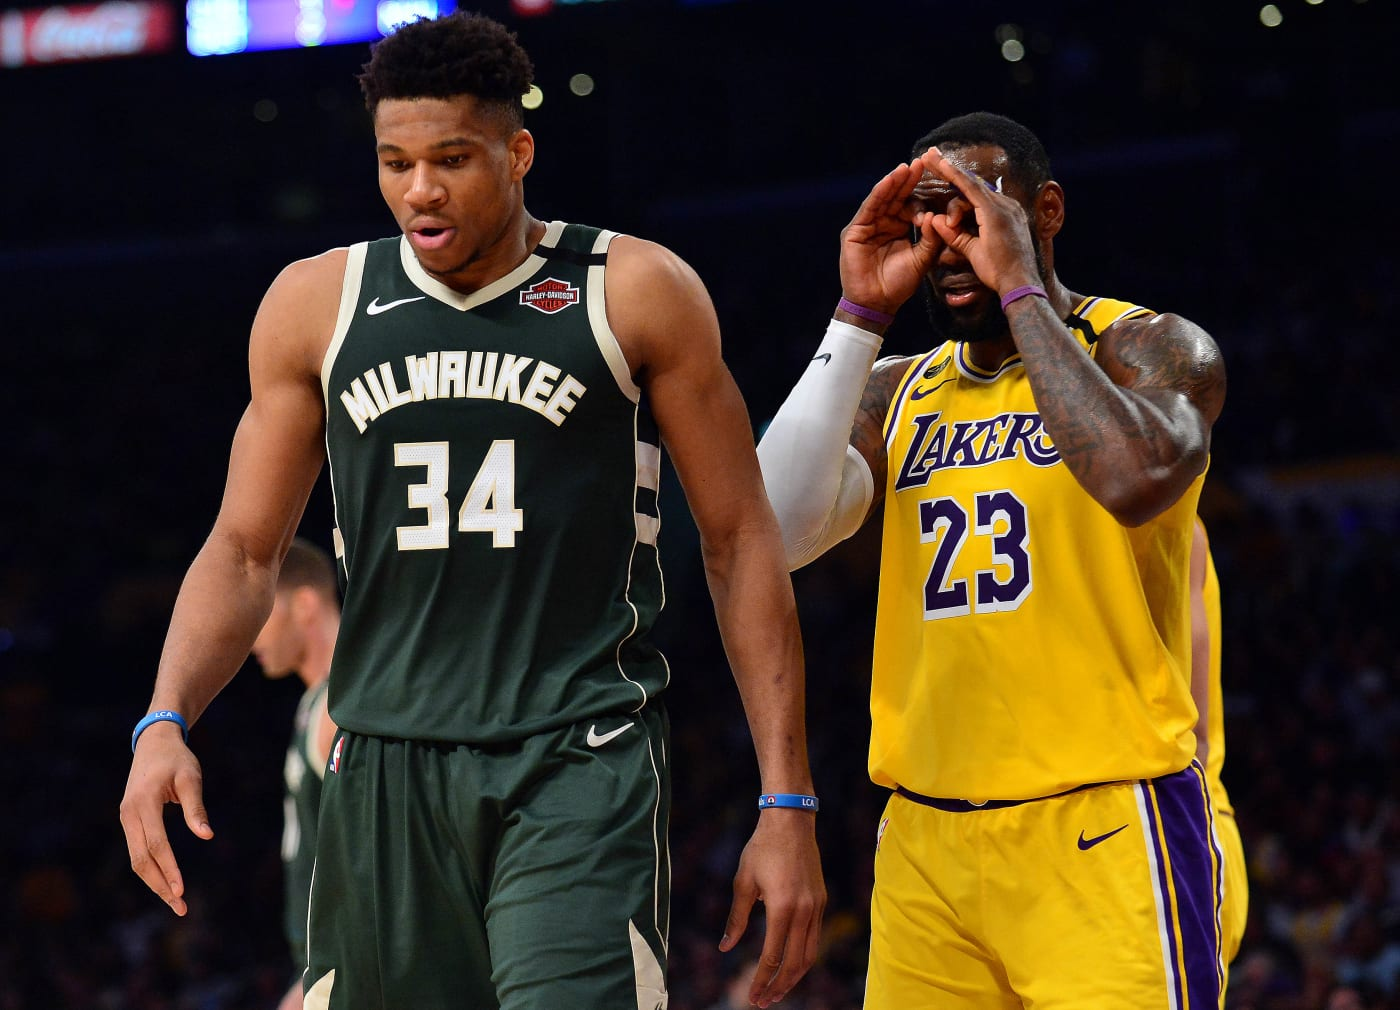 Giannis Antetokounmpo LeBron James Bucks Lakers LA 2020